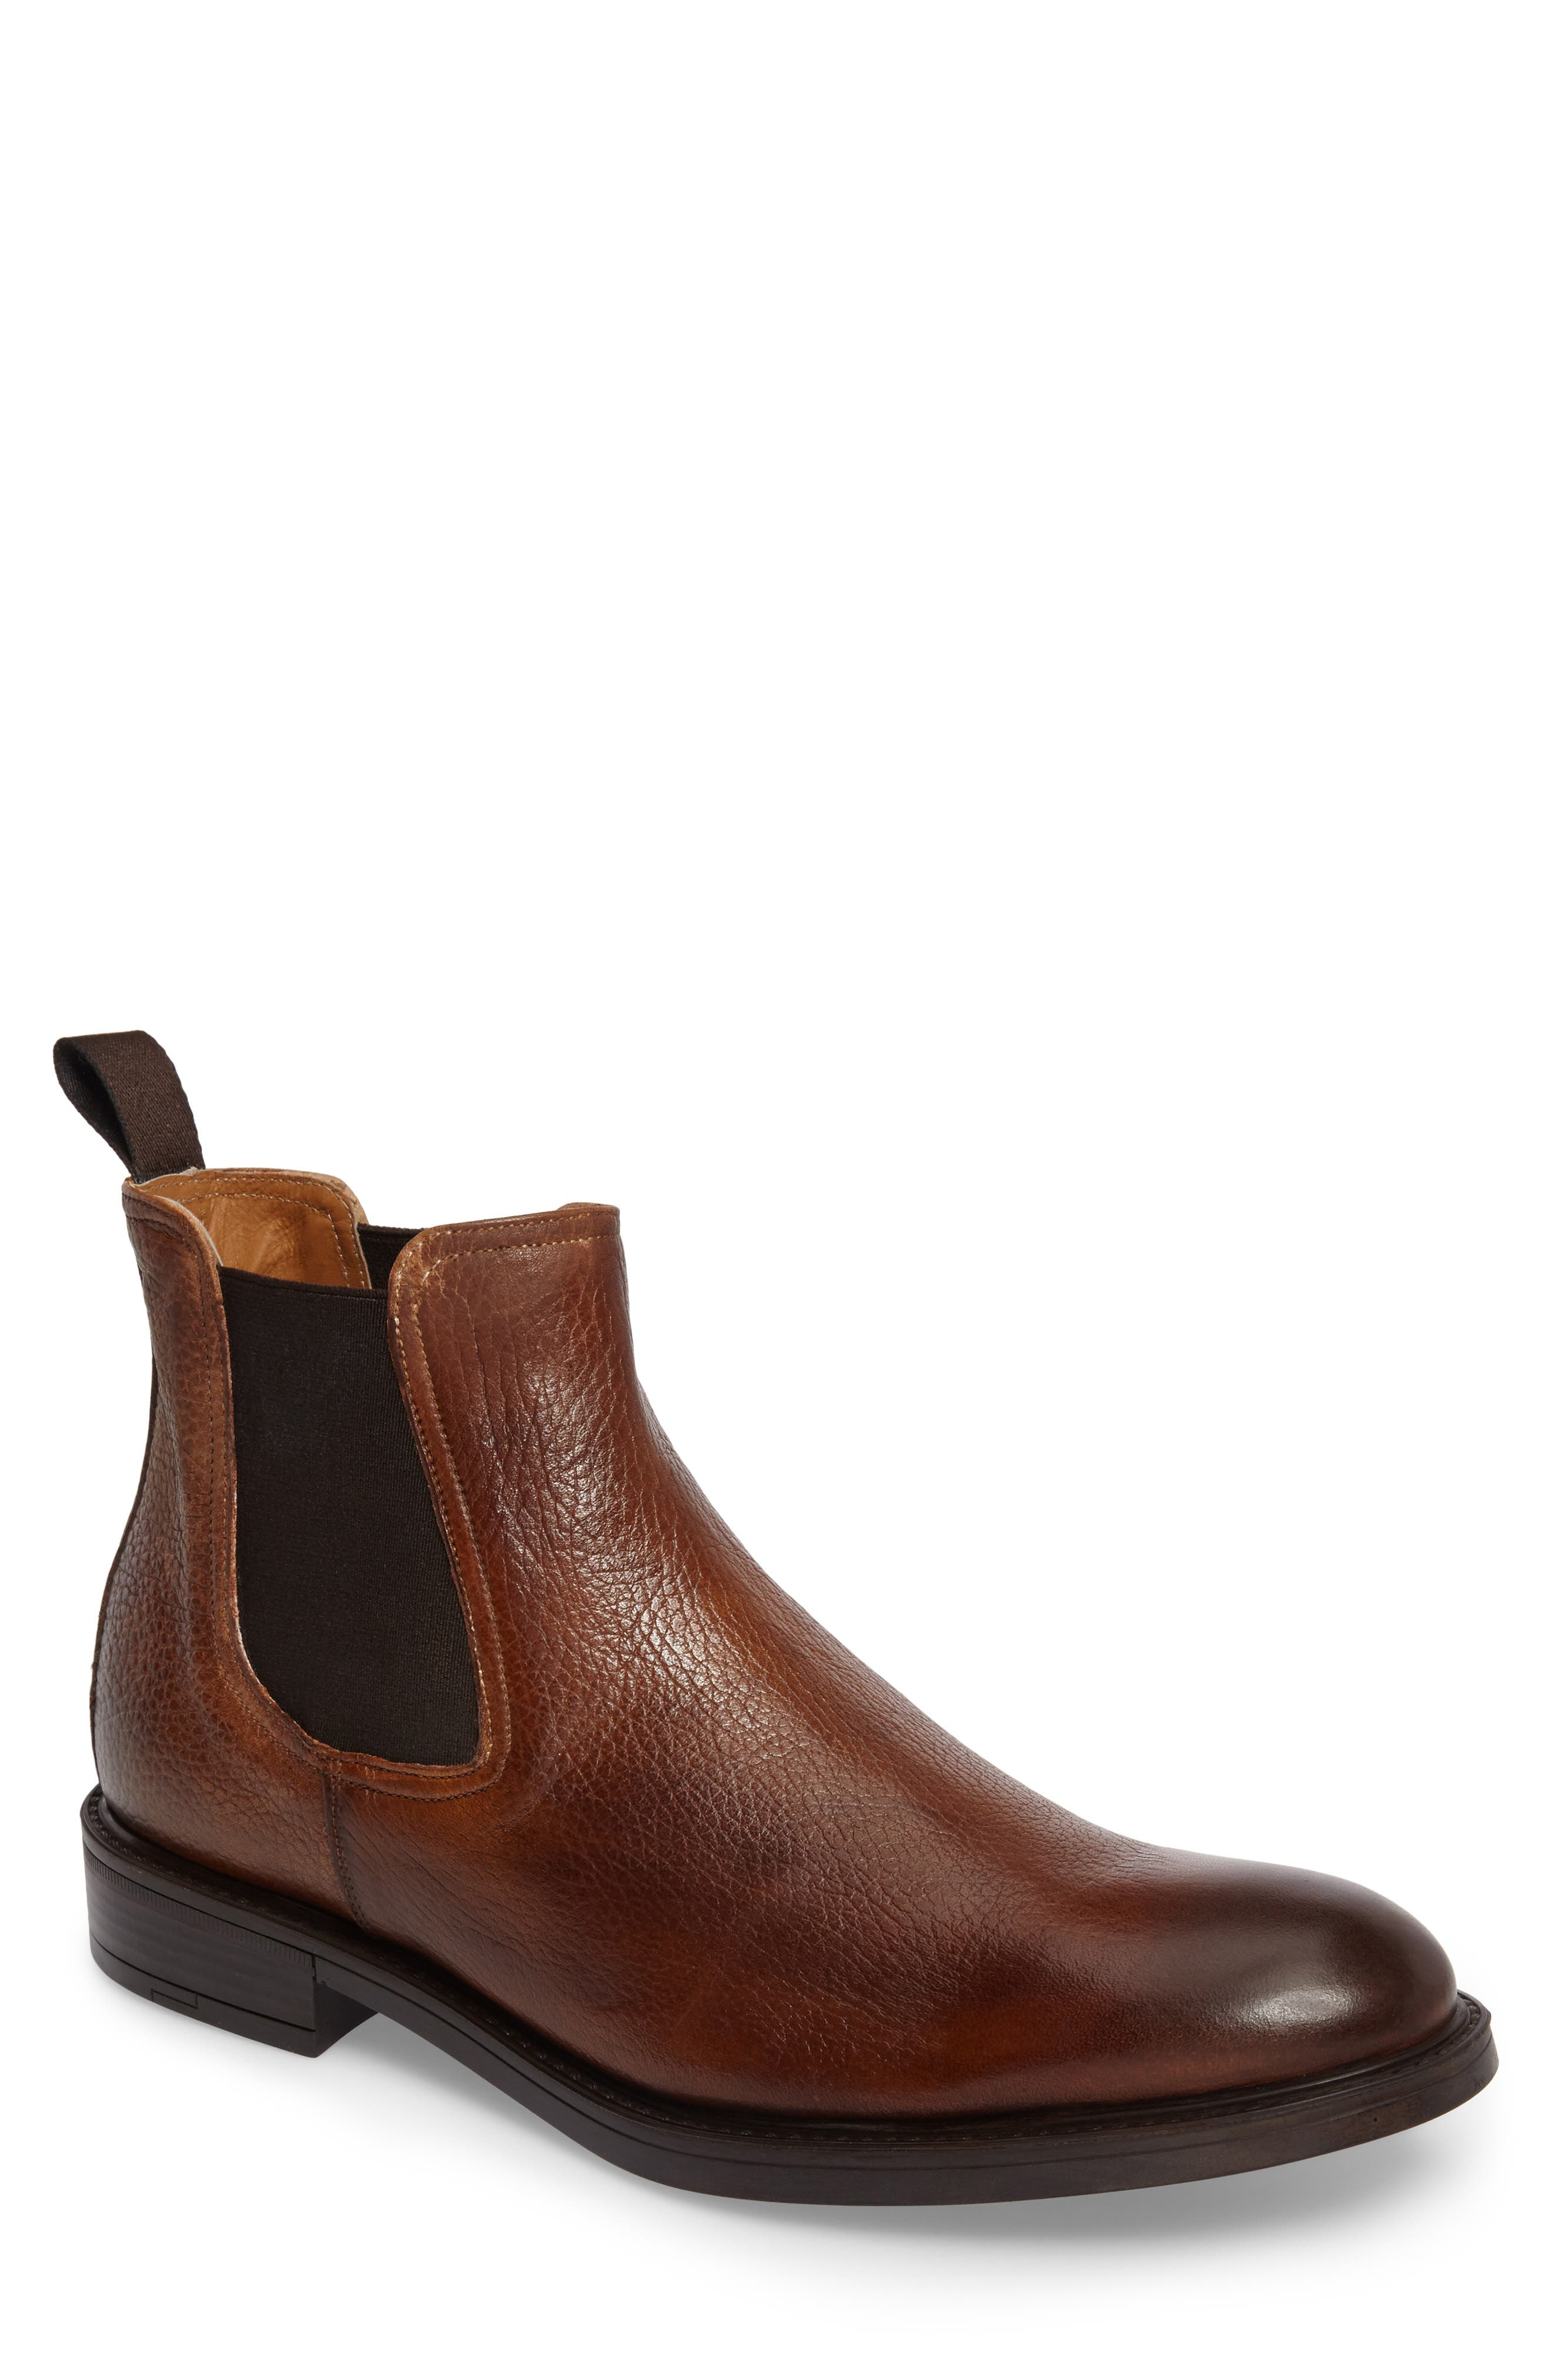 Chelsea Boot,                         Main,                         color, Cognac Leather